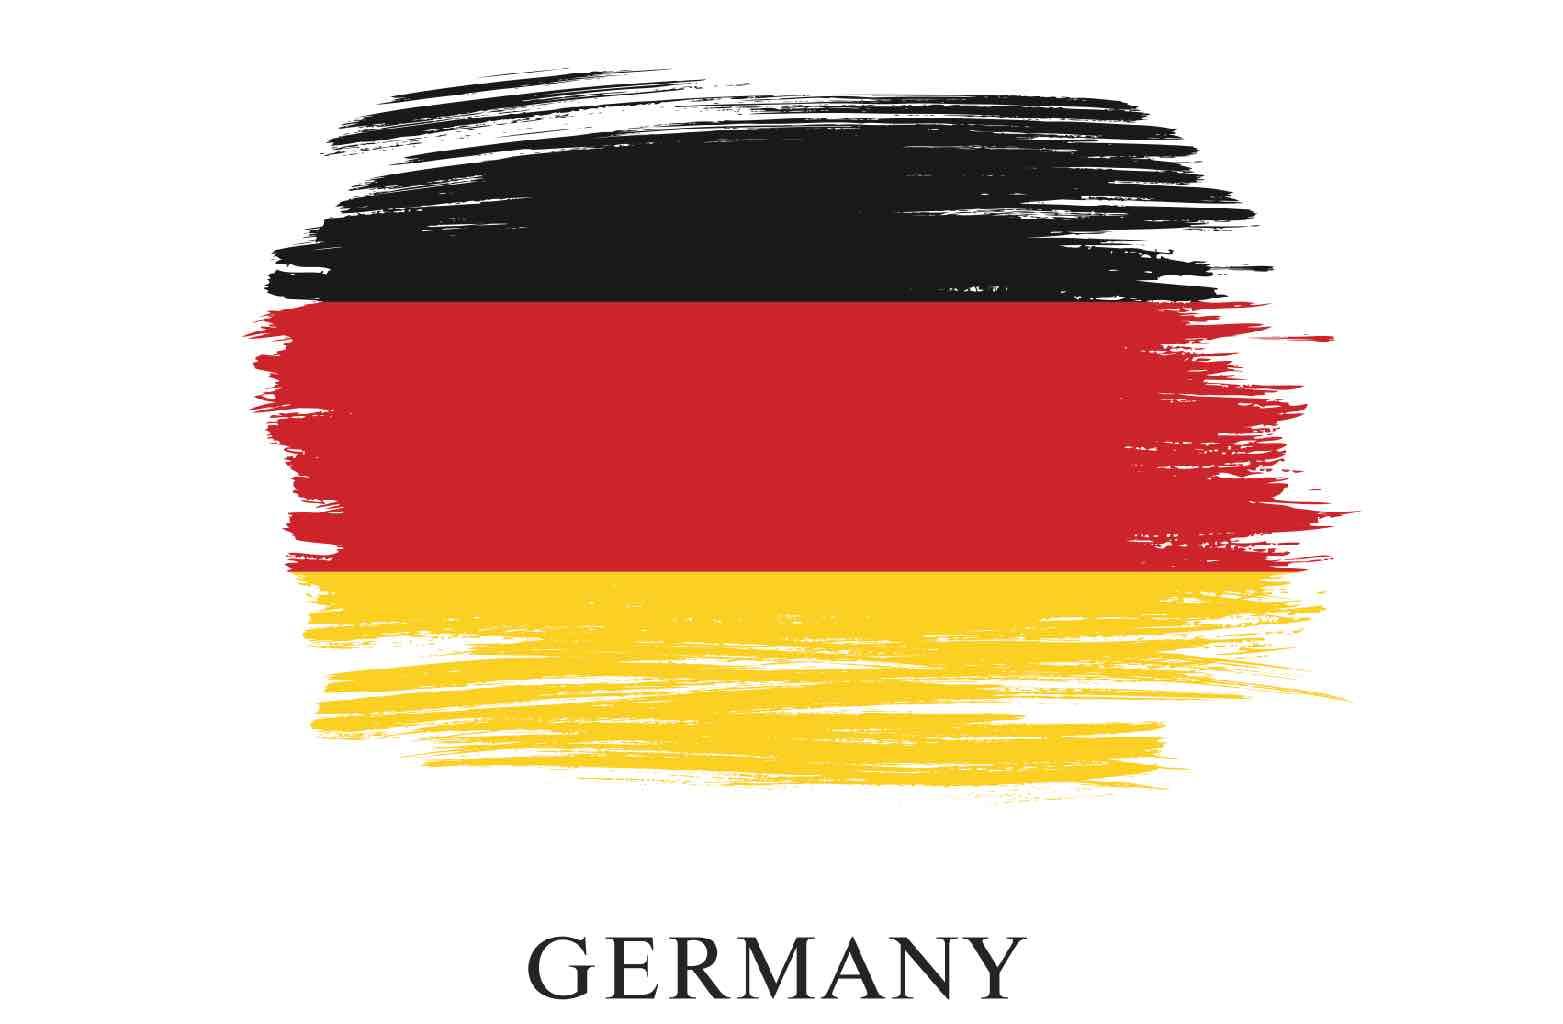 Artistic stressing of German flag